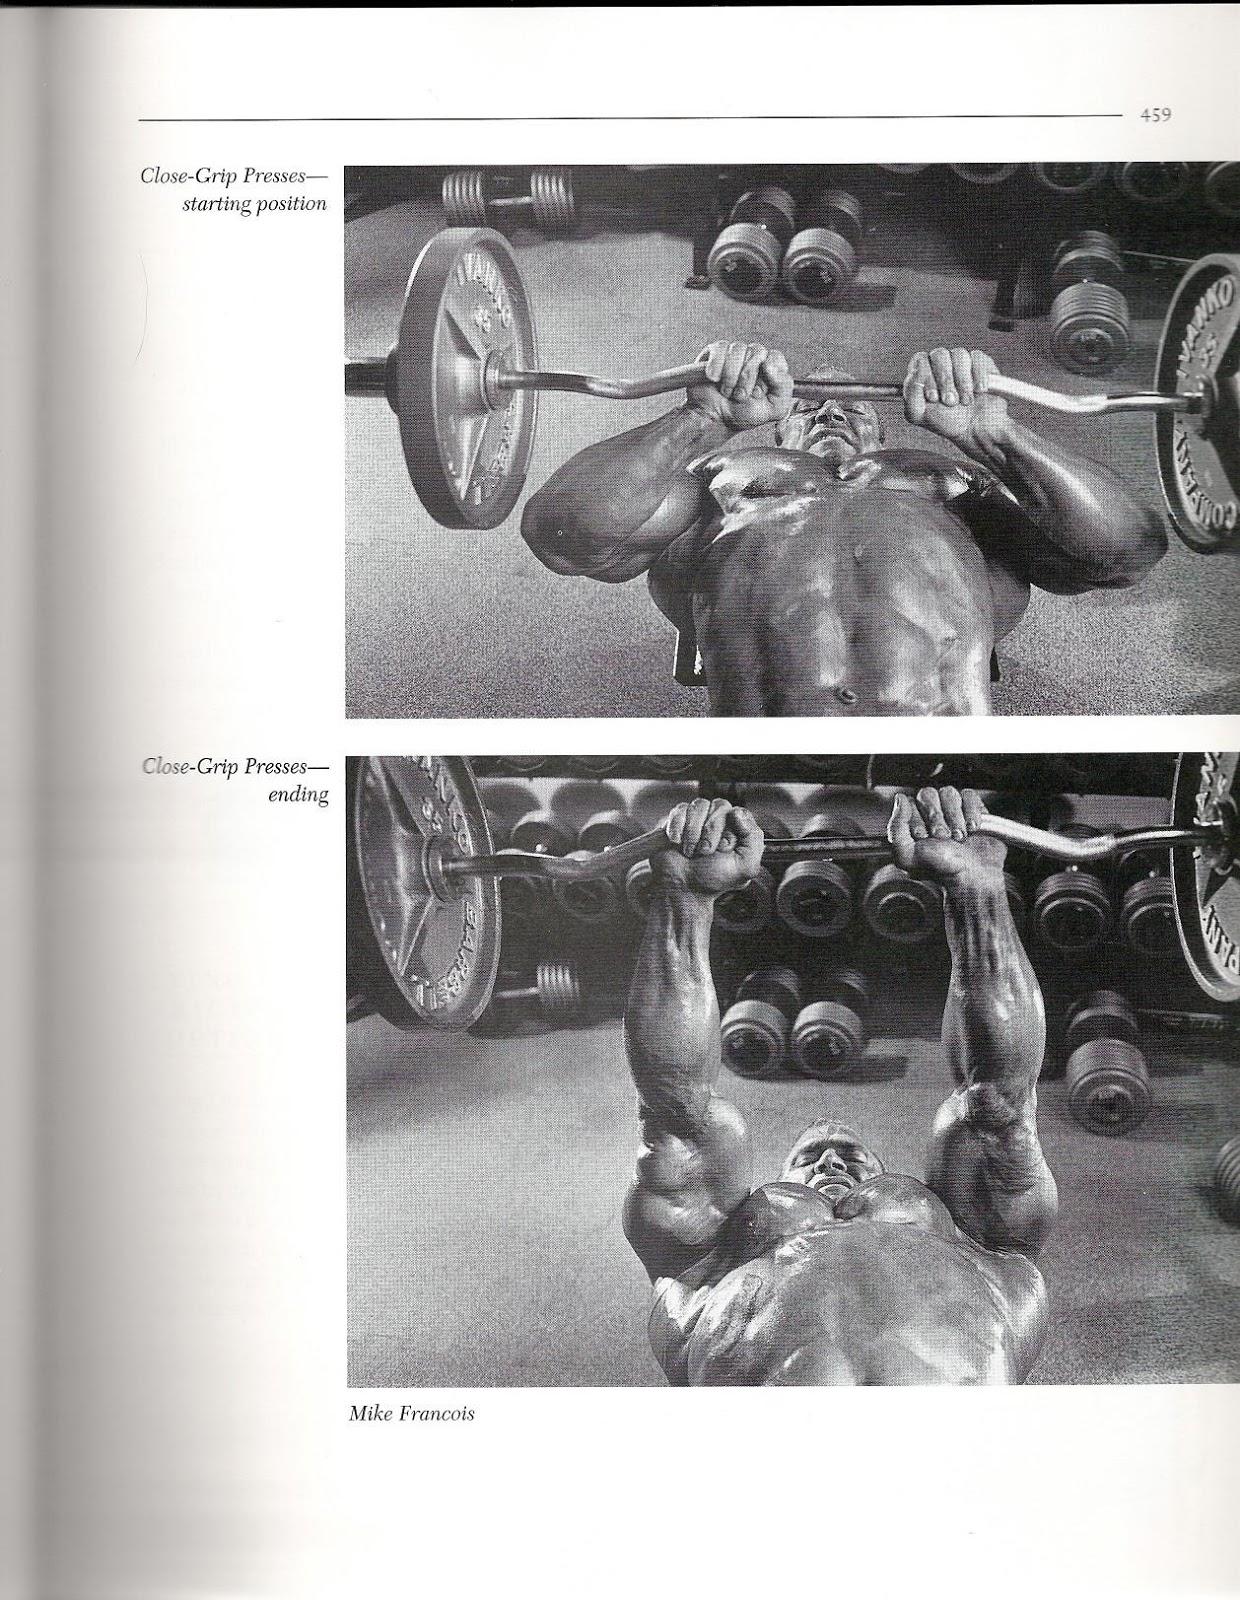 Bodybuilding Workout Books Pdf - Beste Awesome Inspiration